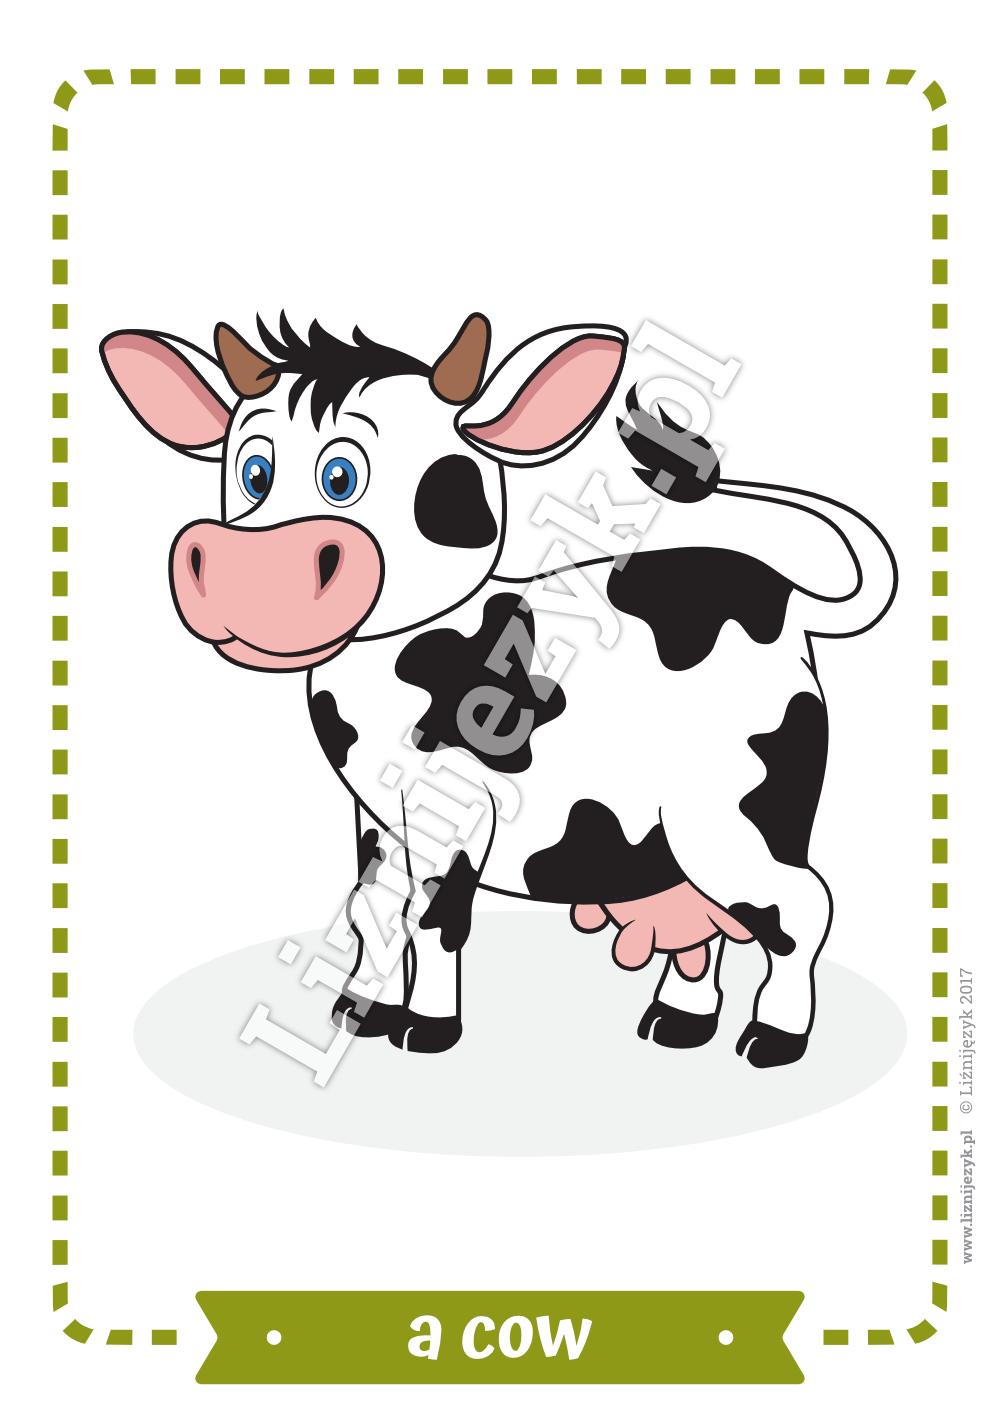 Farm Animals English Flashcards Для детей, Дети